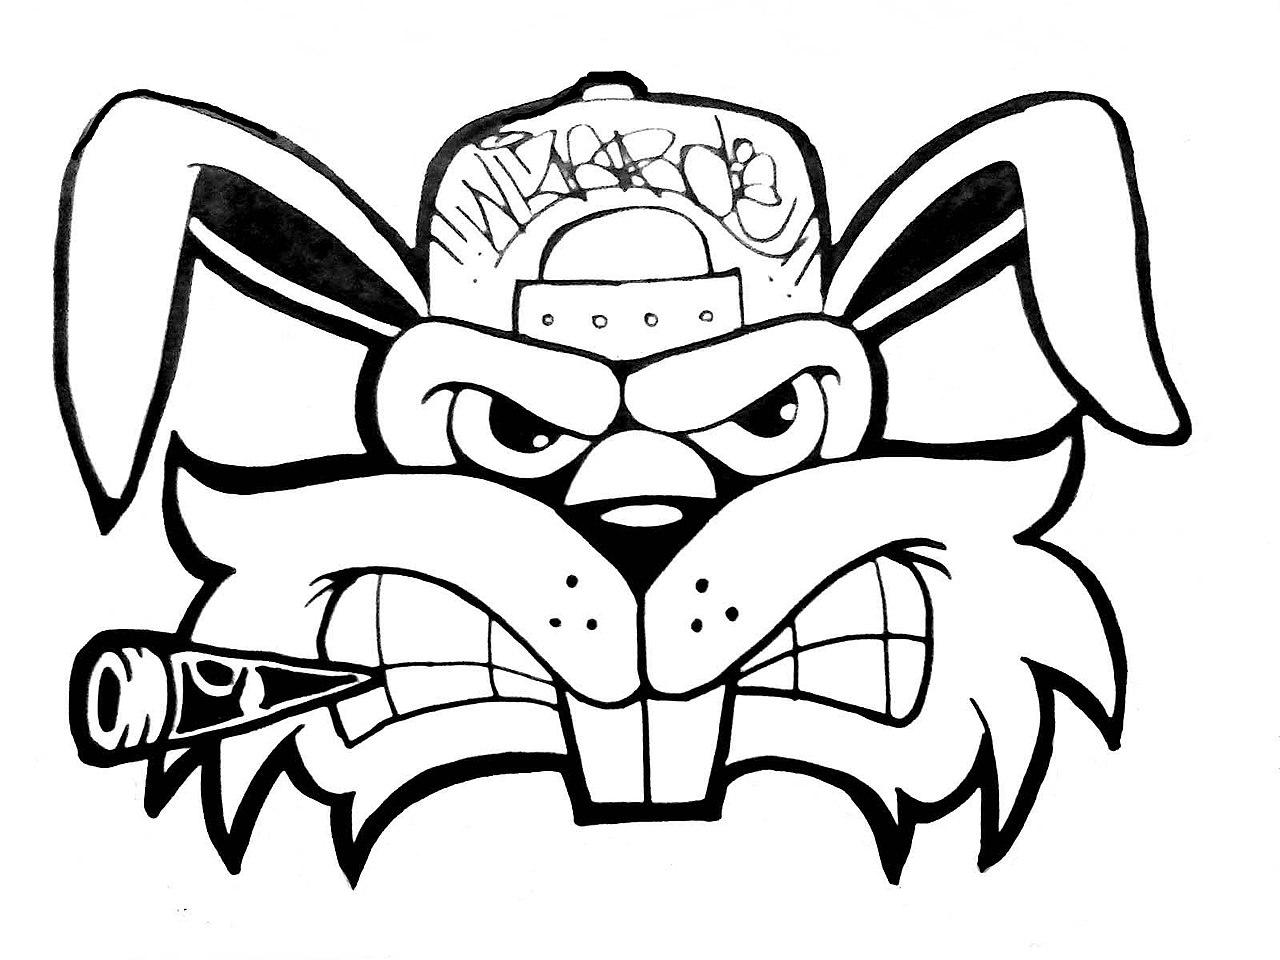 1280x960 Filemonster Rabbit Graffiti How To Draw A Crazy Rabbit Graffiti